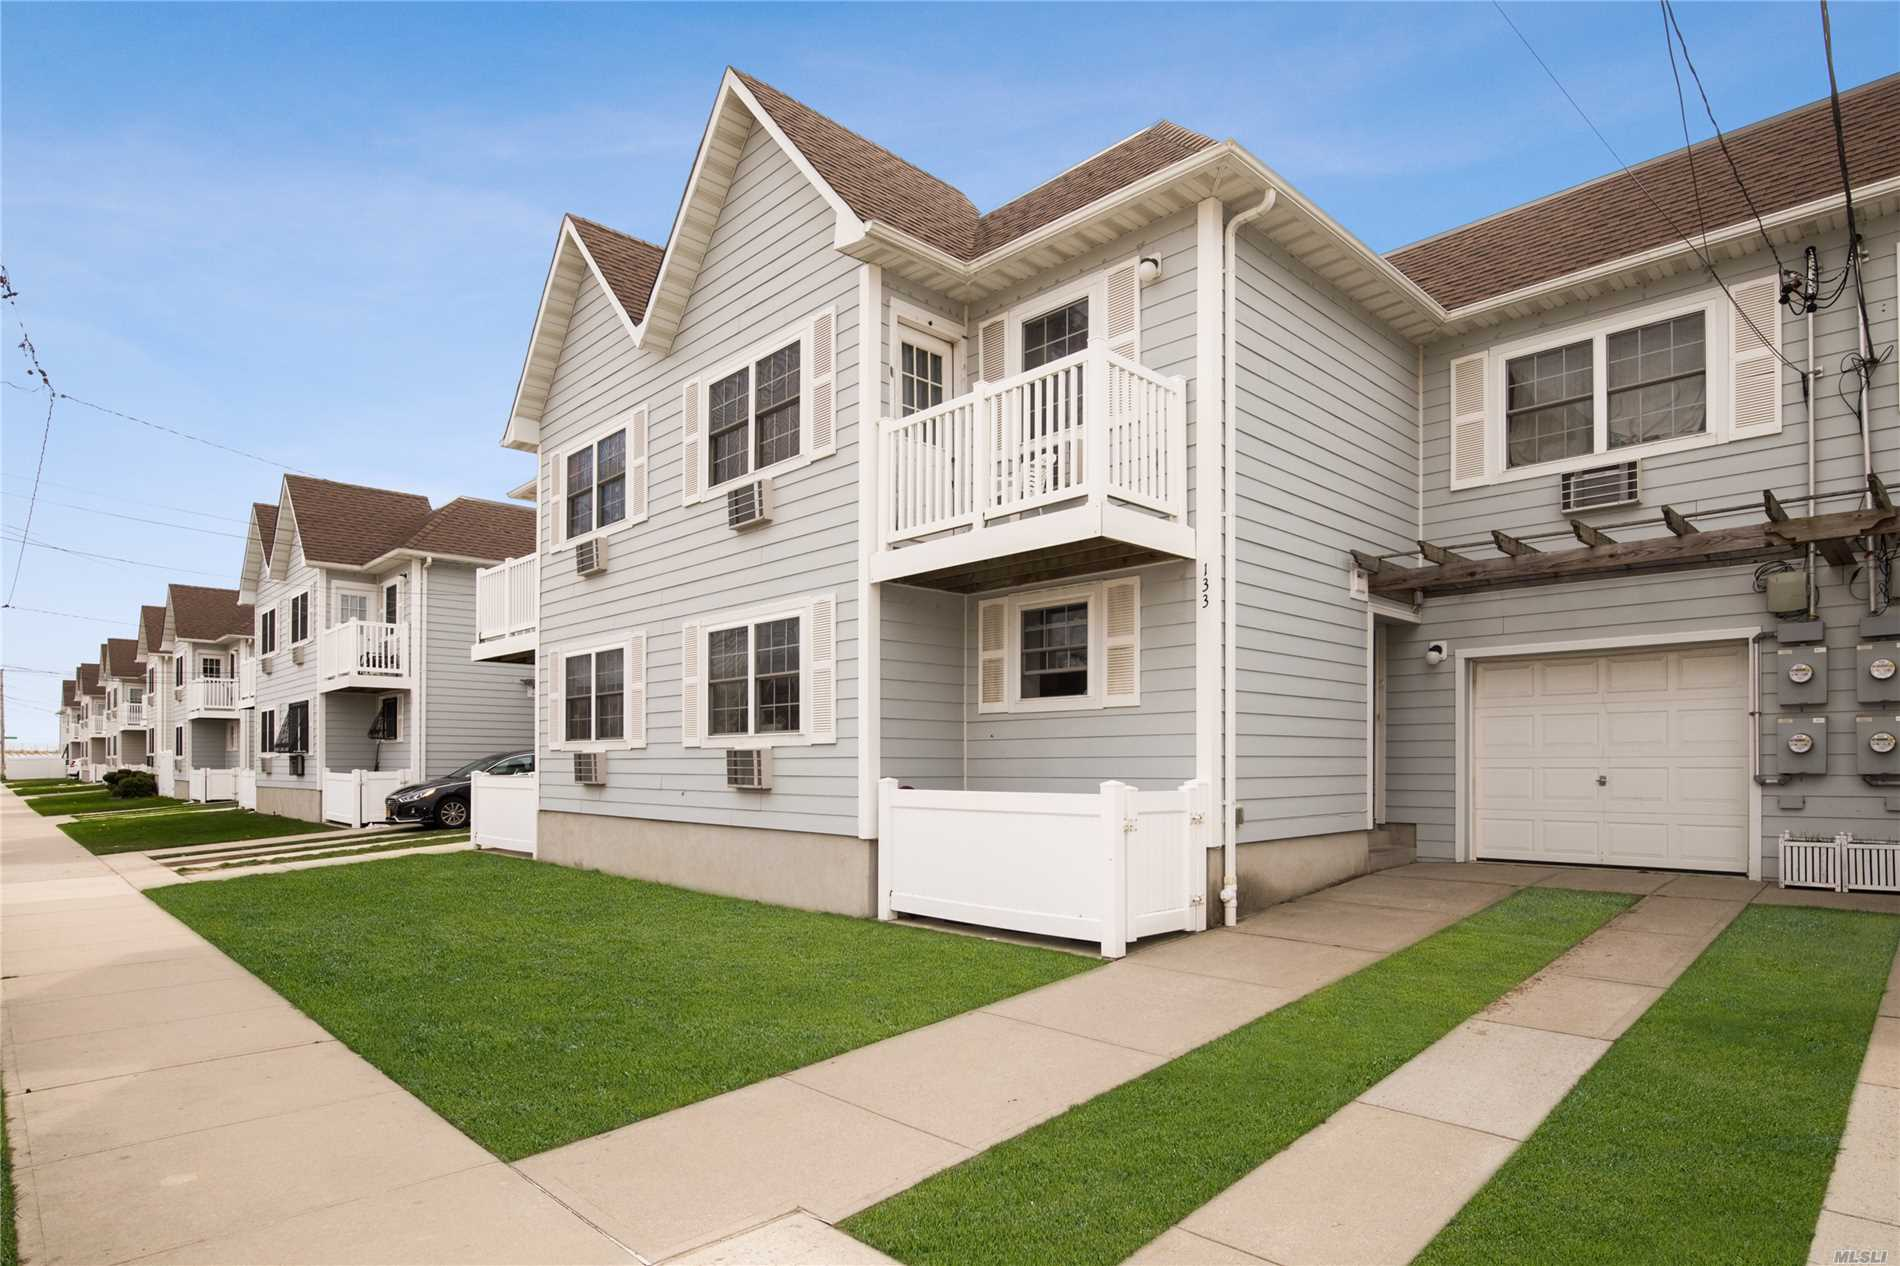 Property for sale at 133 Beach 61st Street, Arverne NY 11692, Arverne,  New York 11692